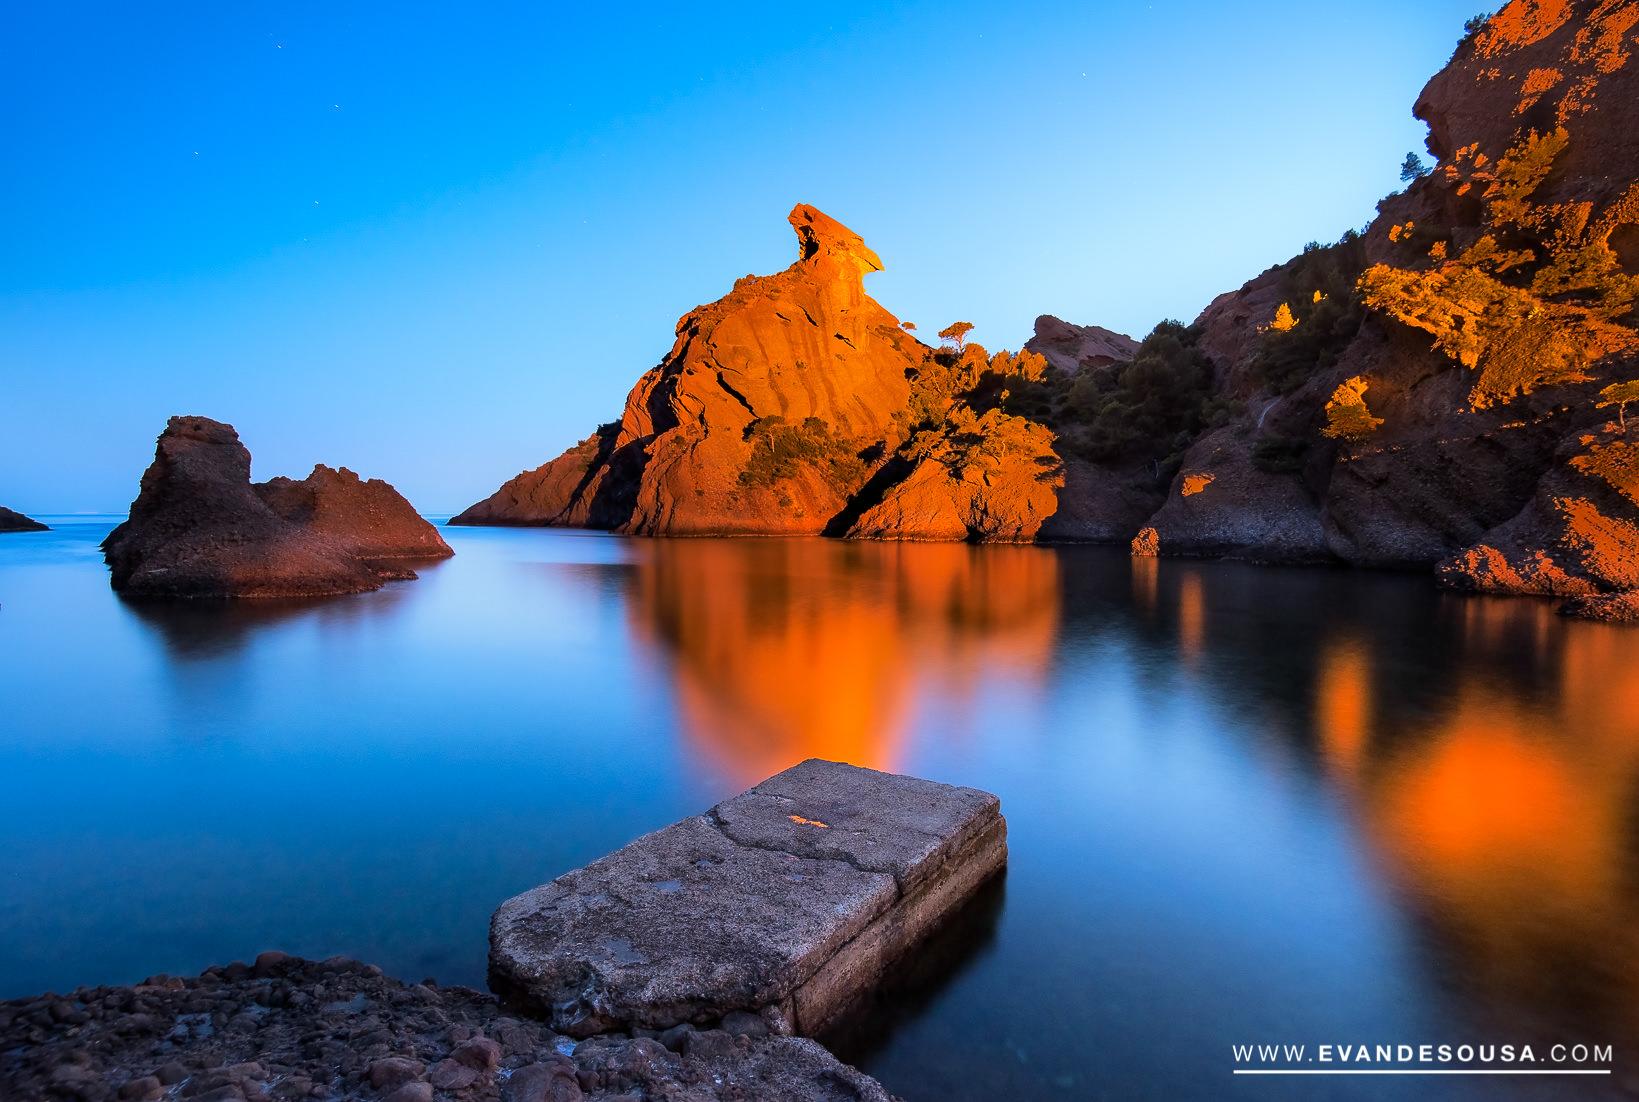 Photographe - Evan De Sousa - France - Marseille - Cassis - Calanque - Islande - Italie - Portugal - Mariage - Photographie - Paca